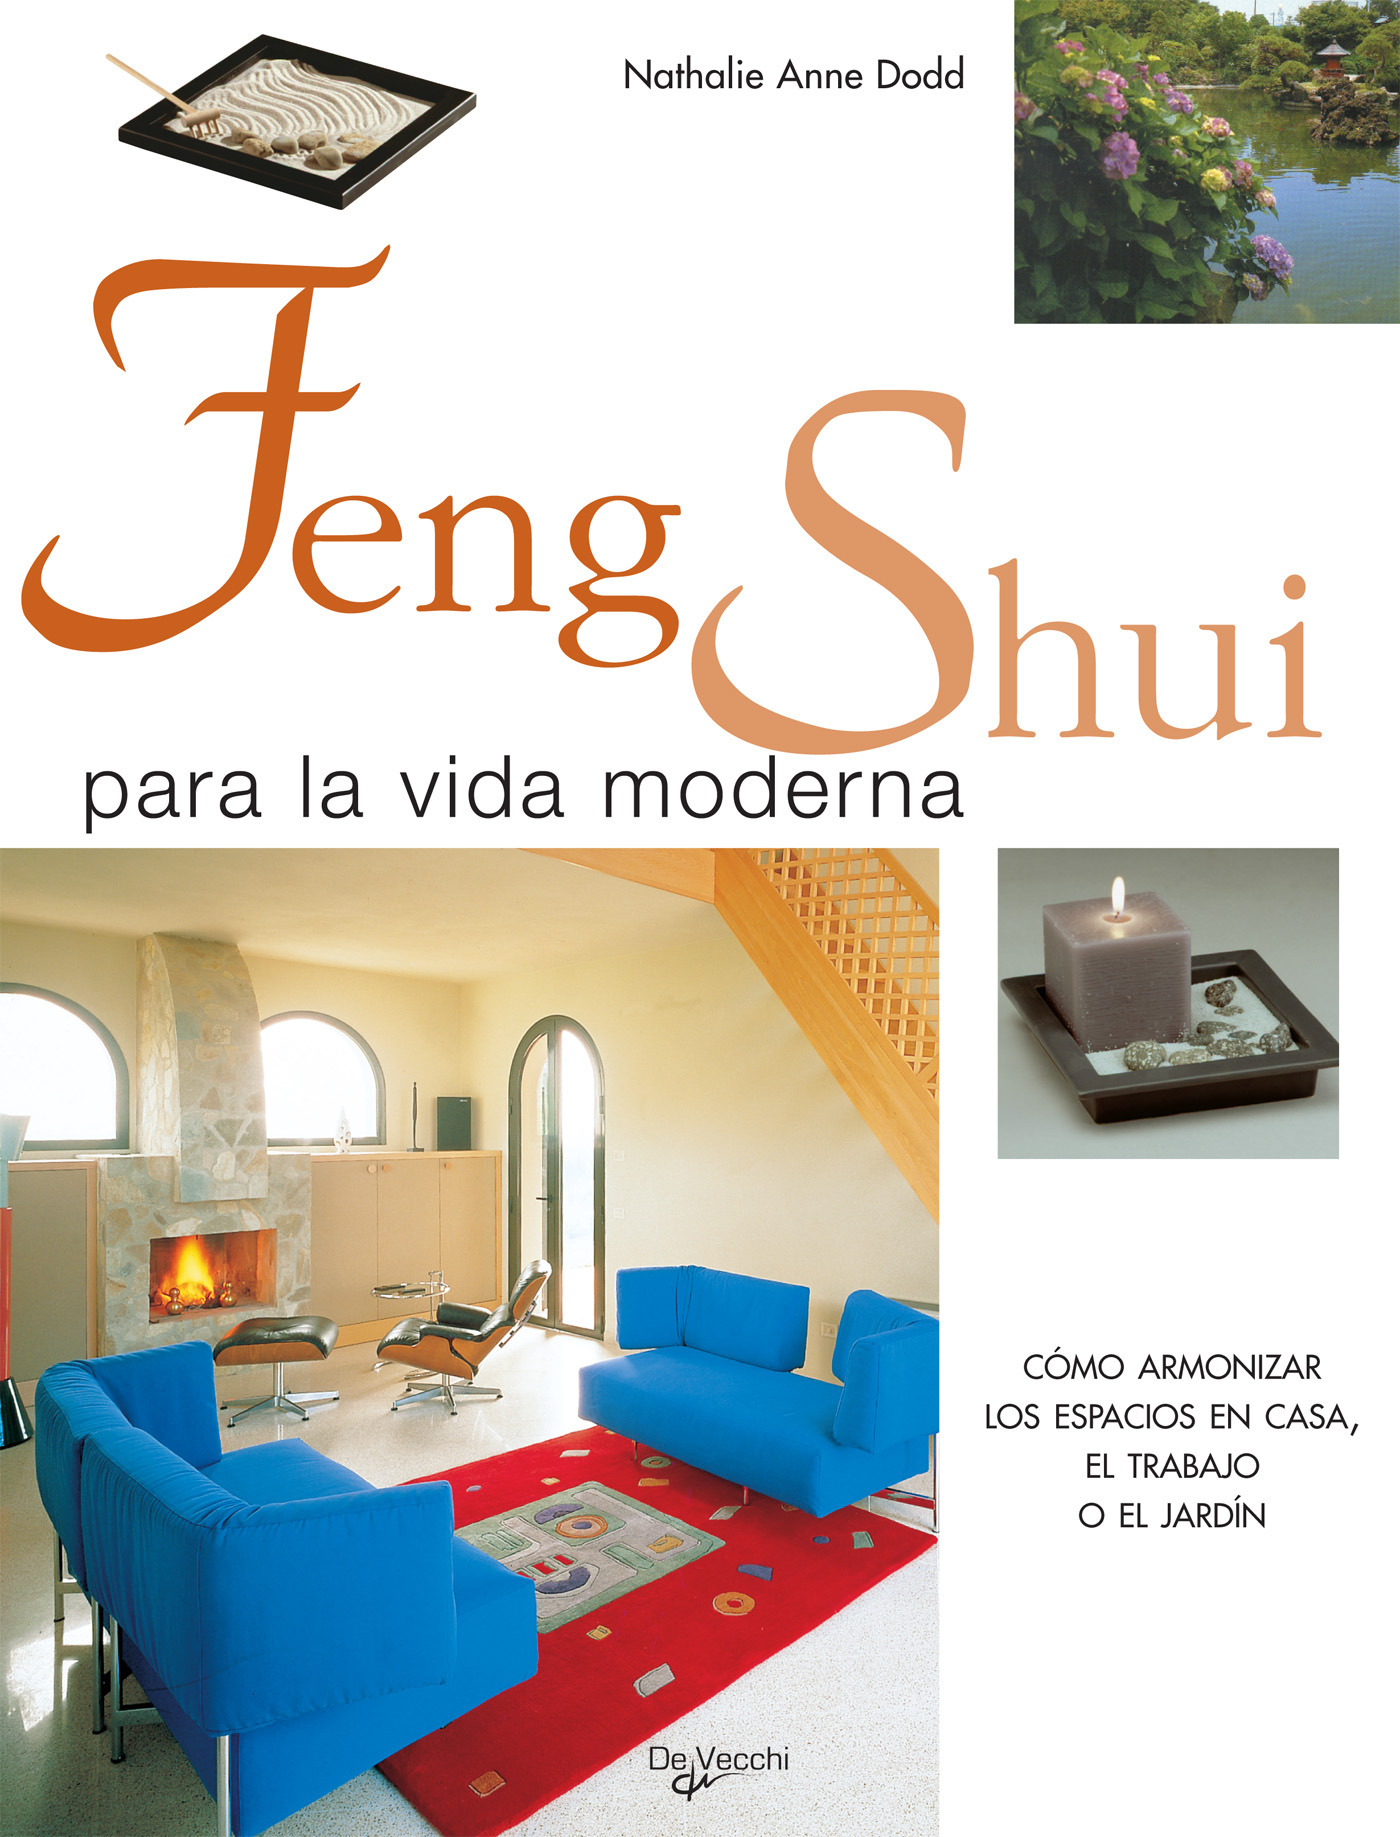 Dodd, Nathalie Anne - Feng shui para la vida moderna, ebook